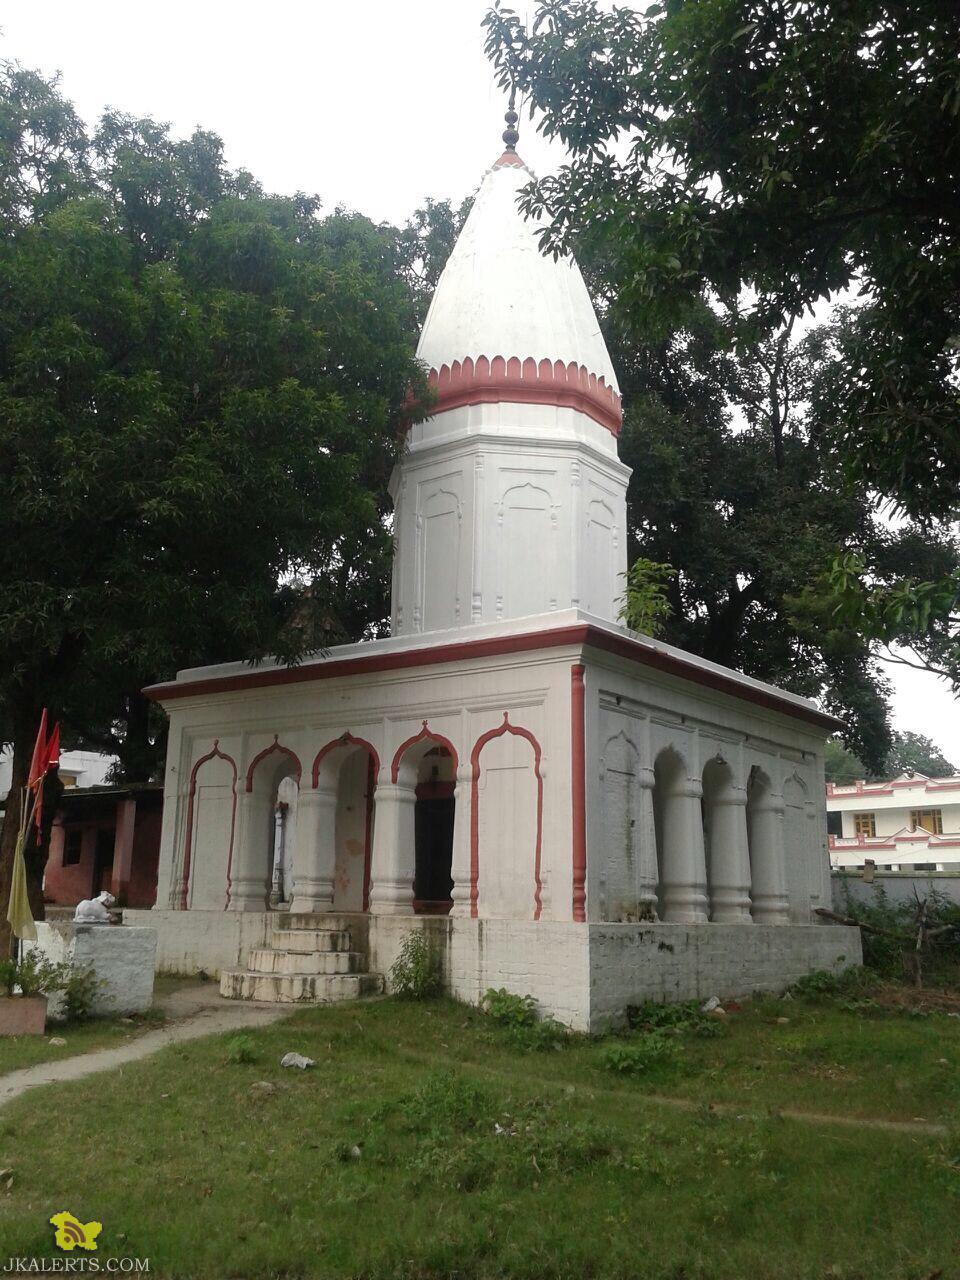 Jandi Garden: A natural souvenir in Hiranagar tehsil situated